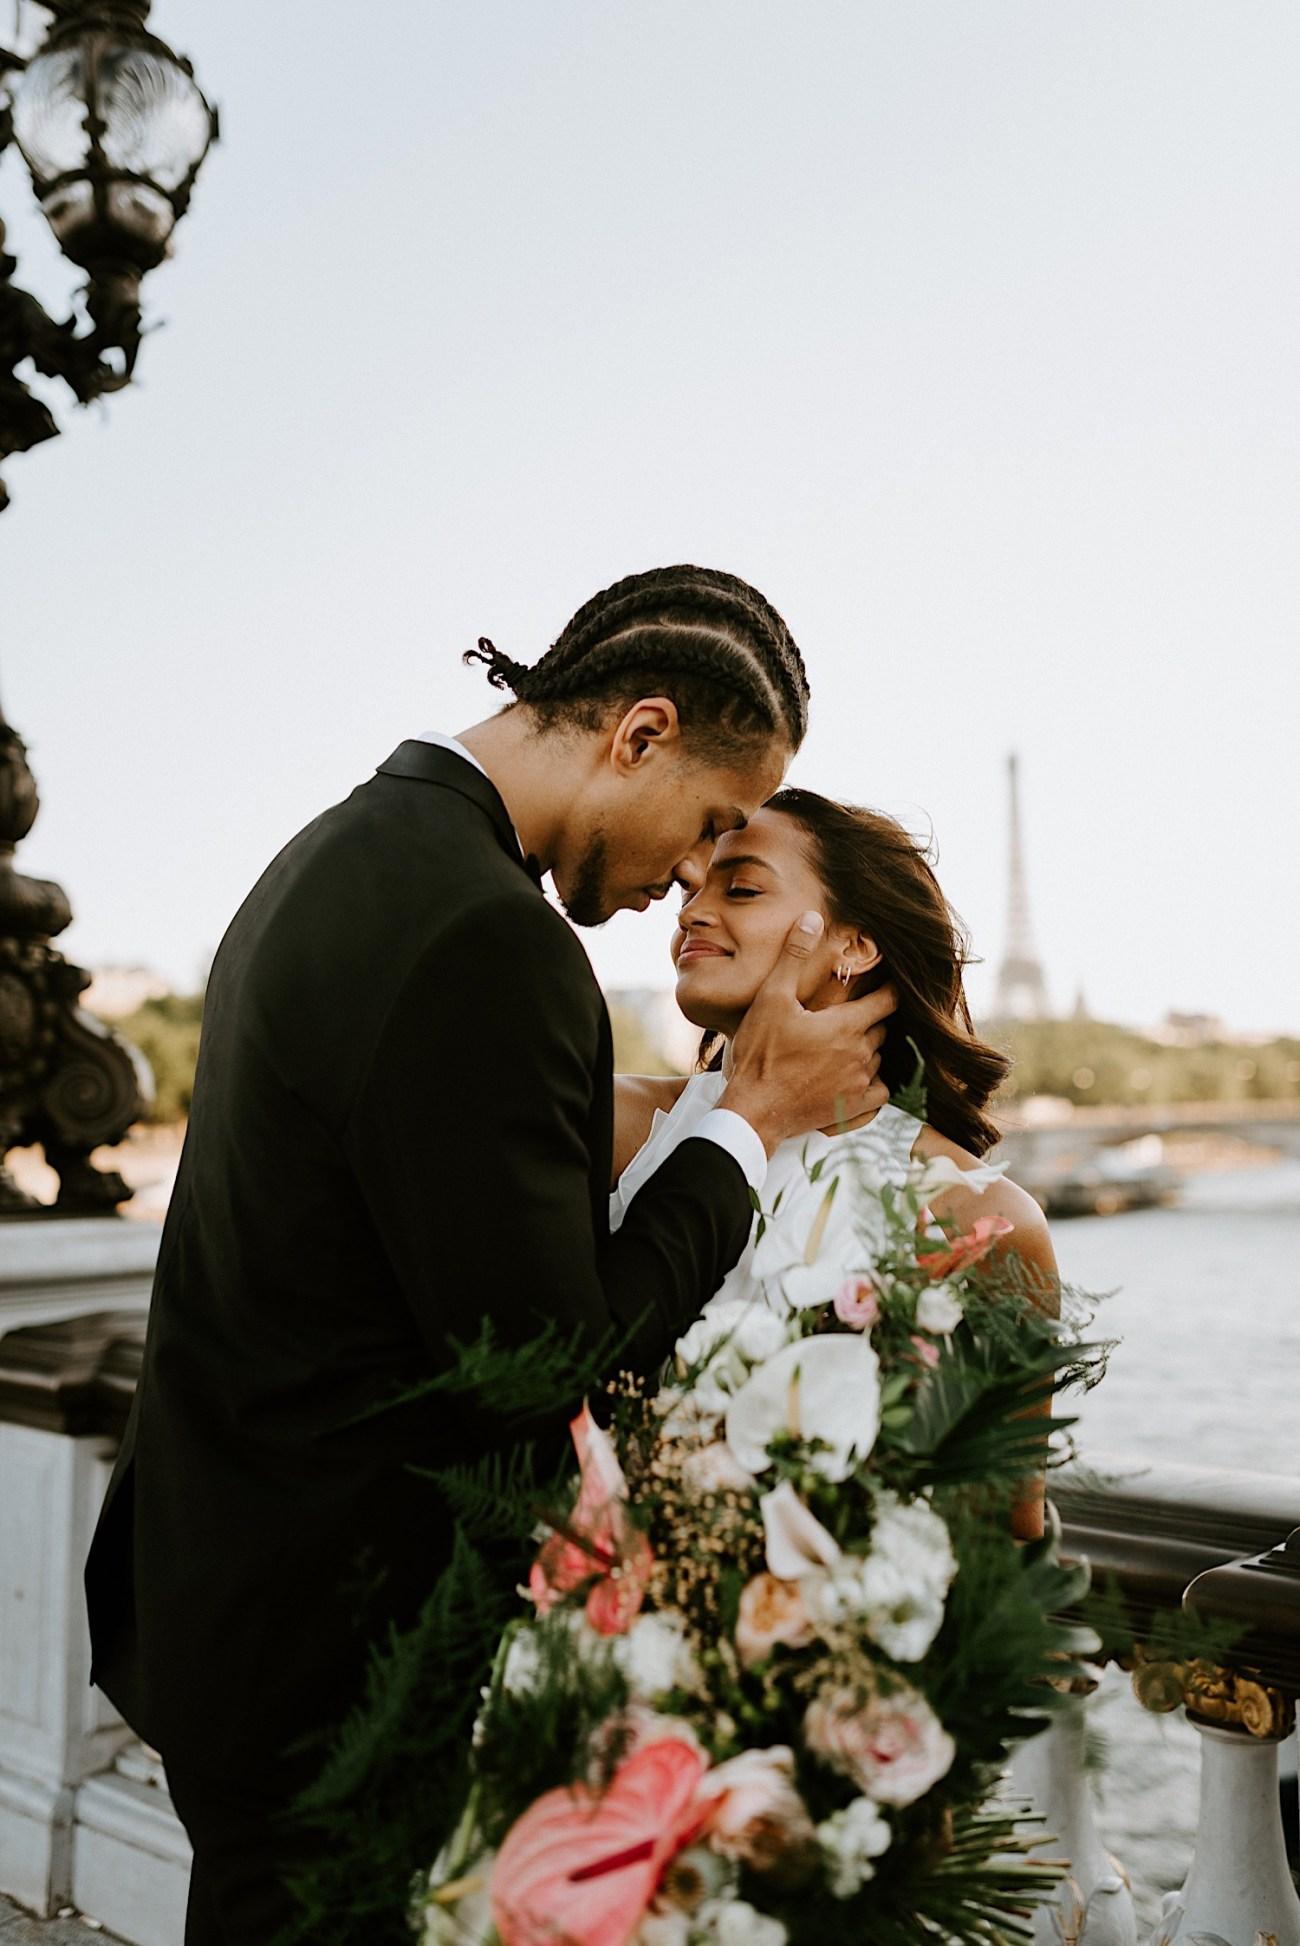 Paris Wedding Photos Paris Wedding Photographer Paris Photographe De Marriage Pont Alexandre Wedding Photos Anais Possamai Photography 29